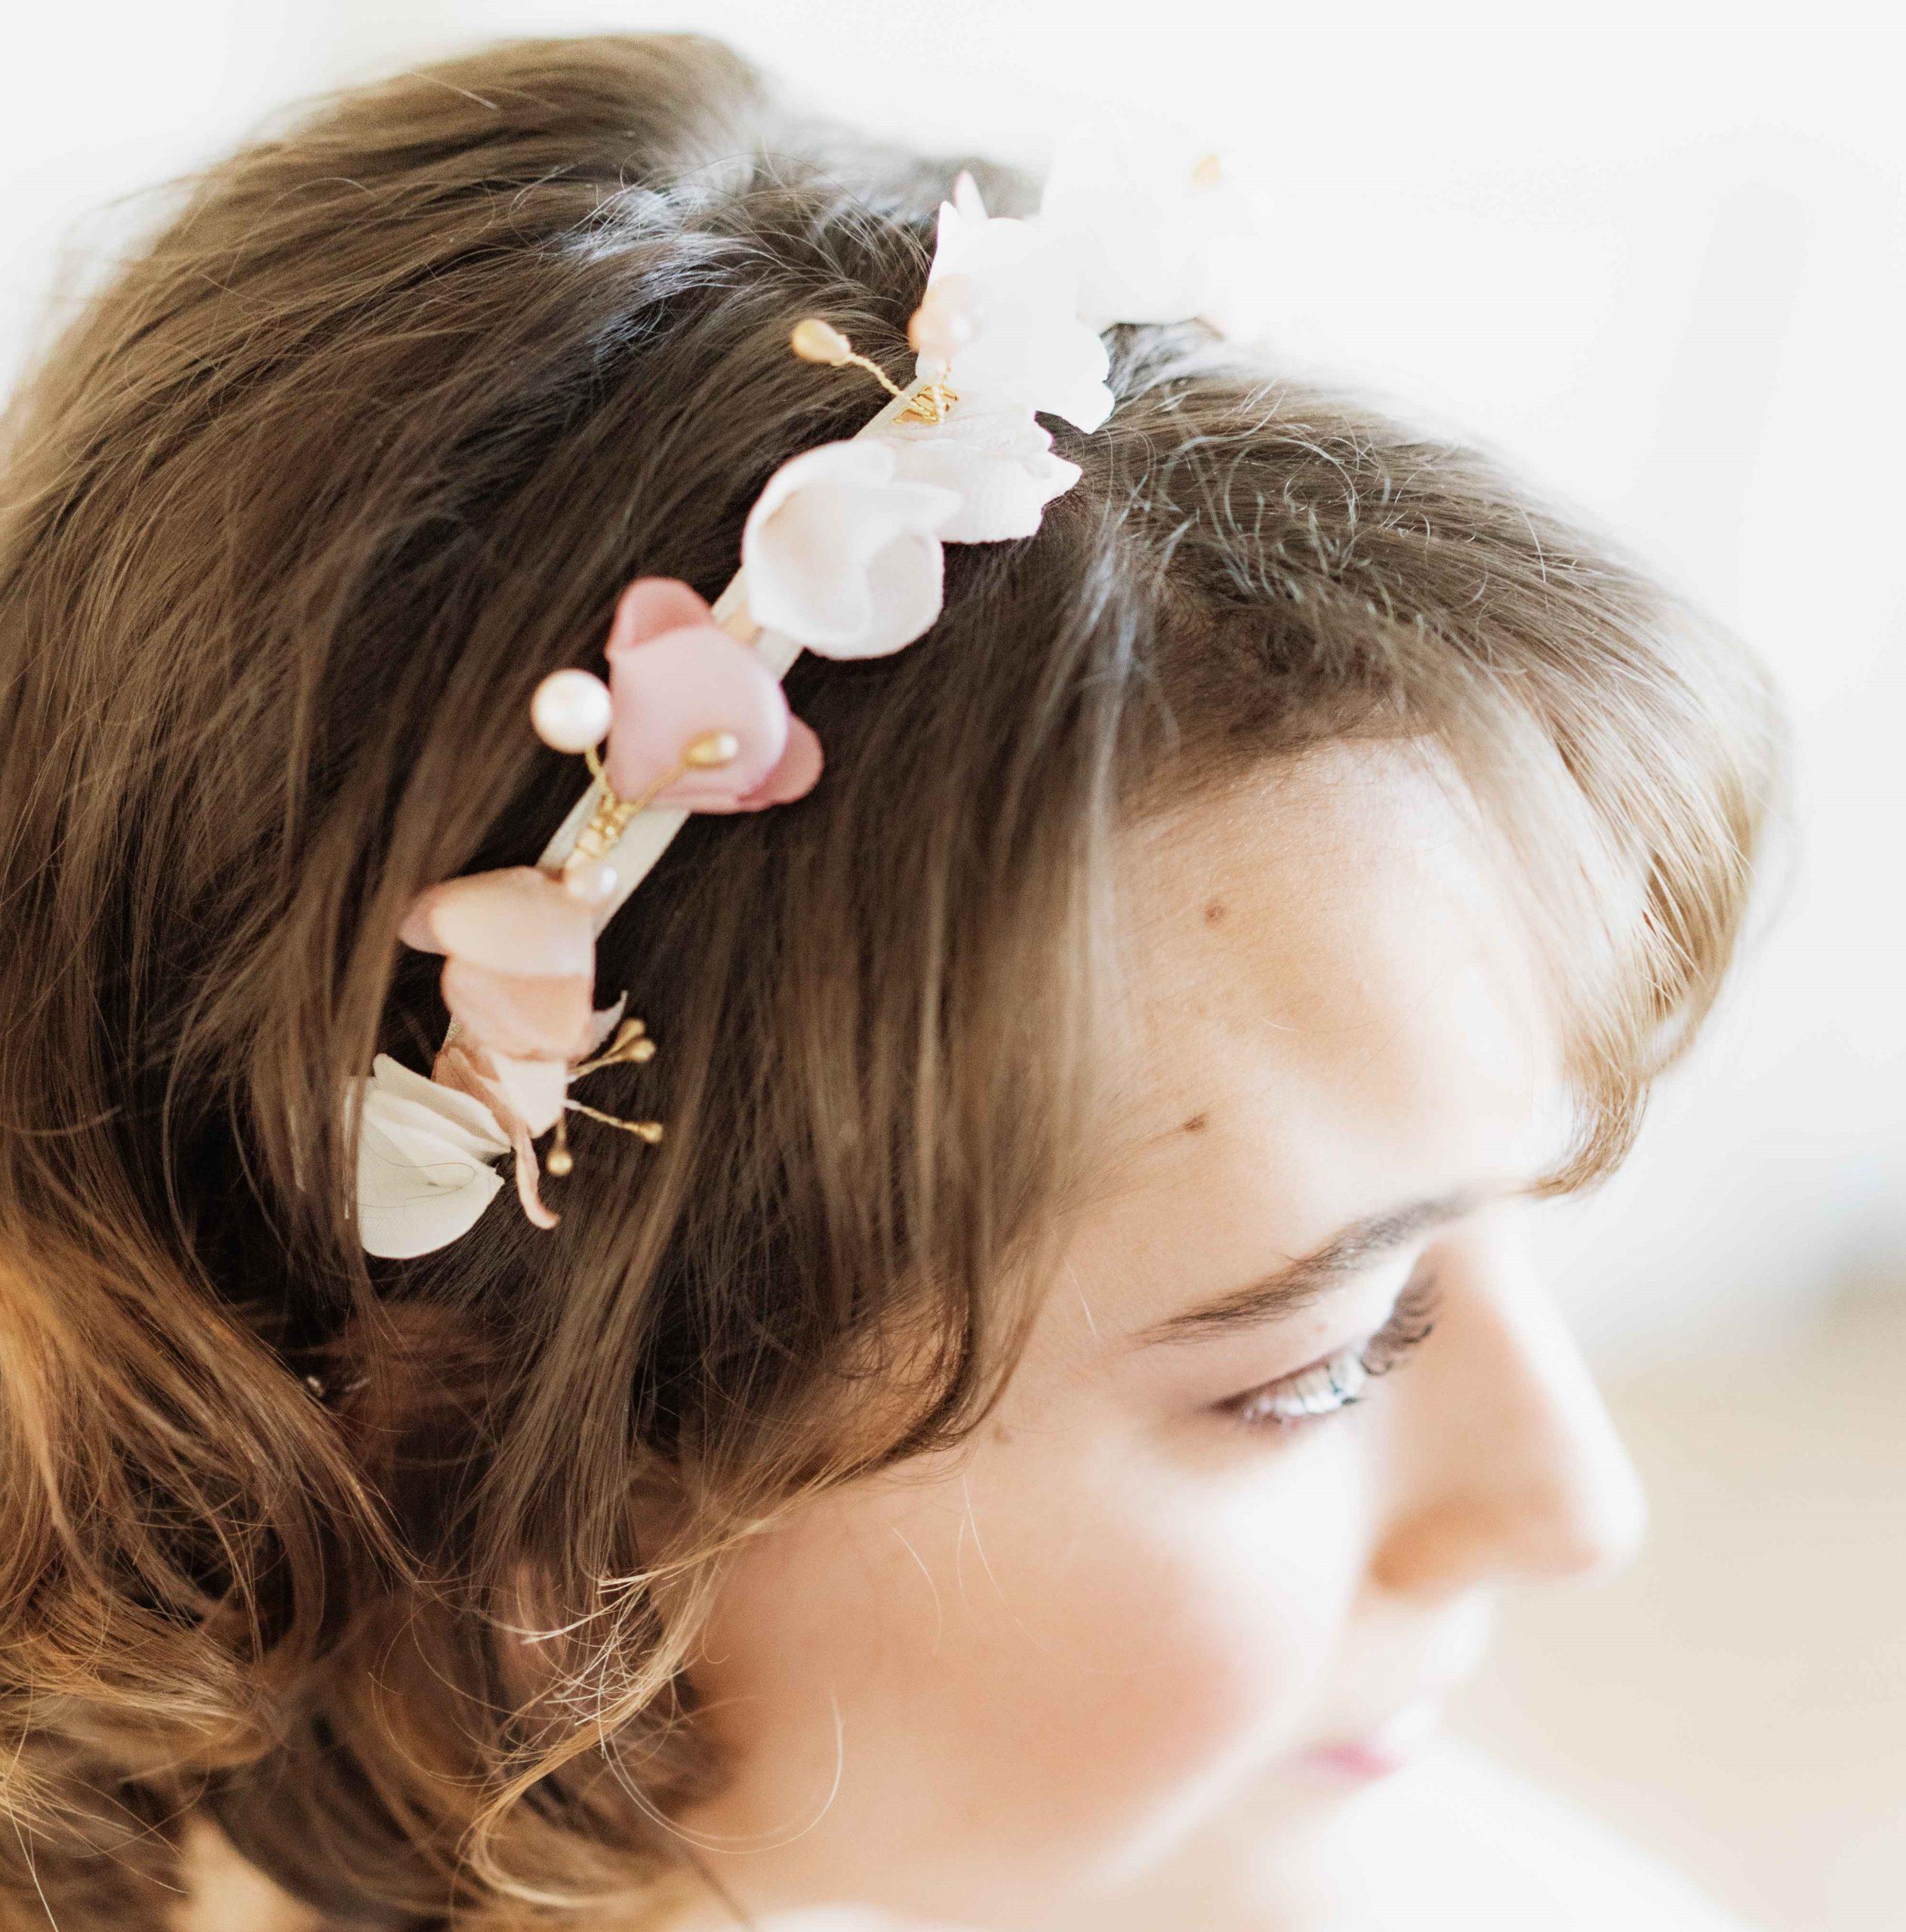 Couronne Bertille 4 Alice Marty - Couture florale Accessoires Mariage